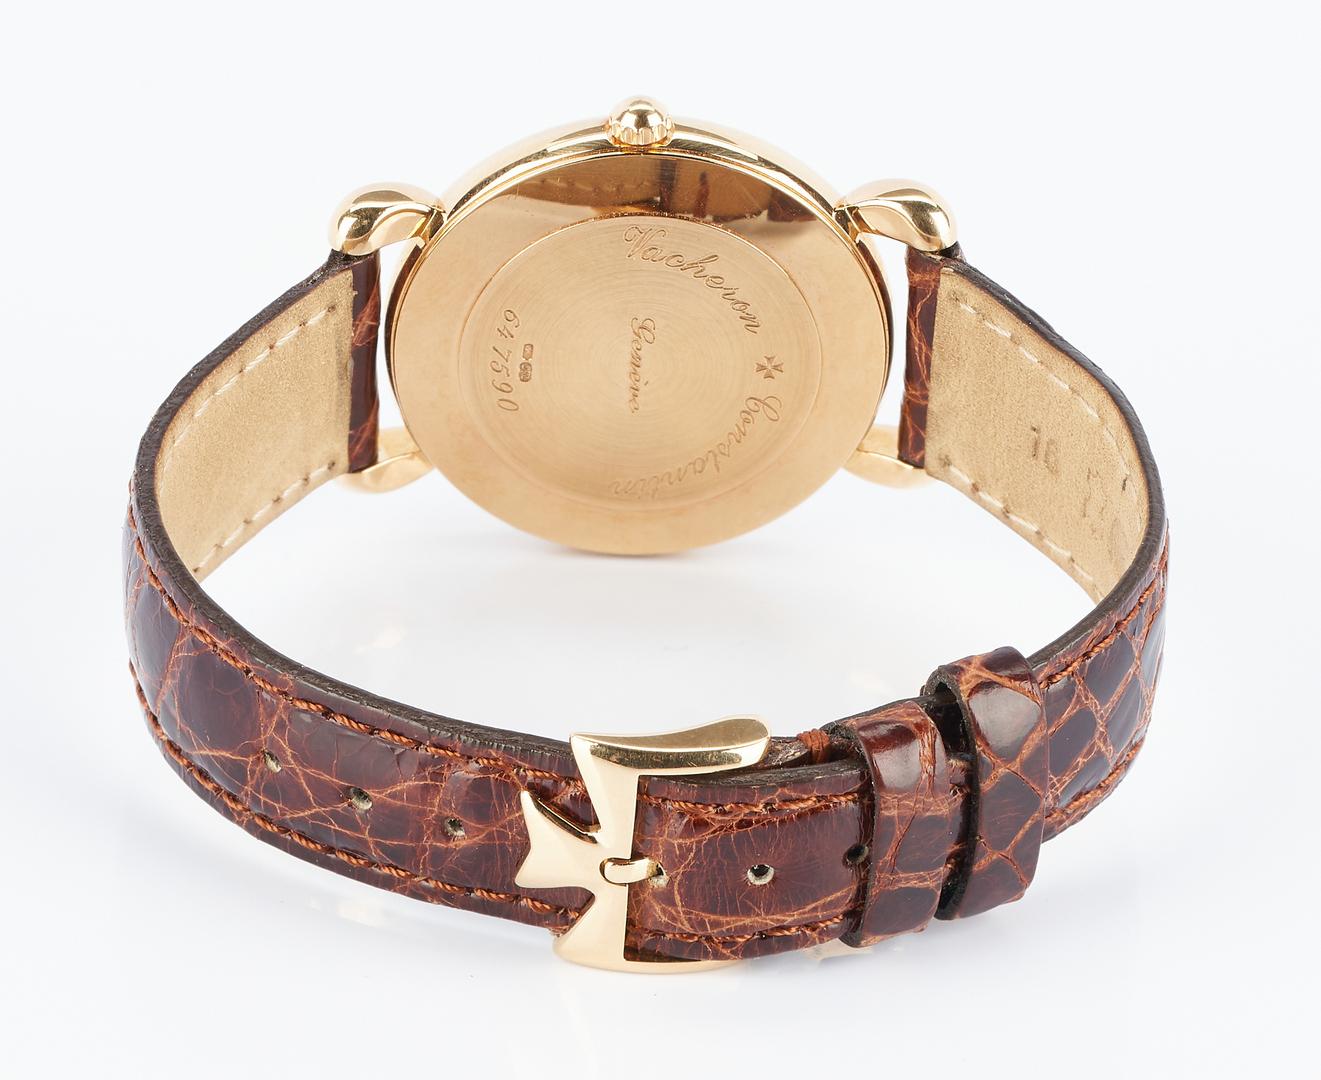 Lot 45: Vacheron 18K Constantin Patrimony Wrist Watch